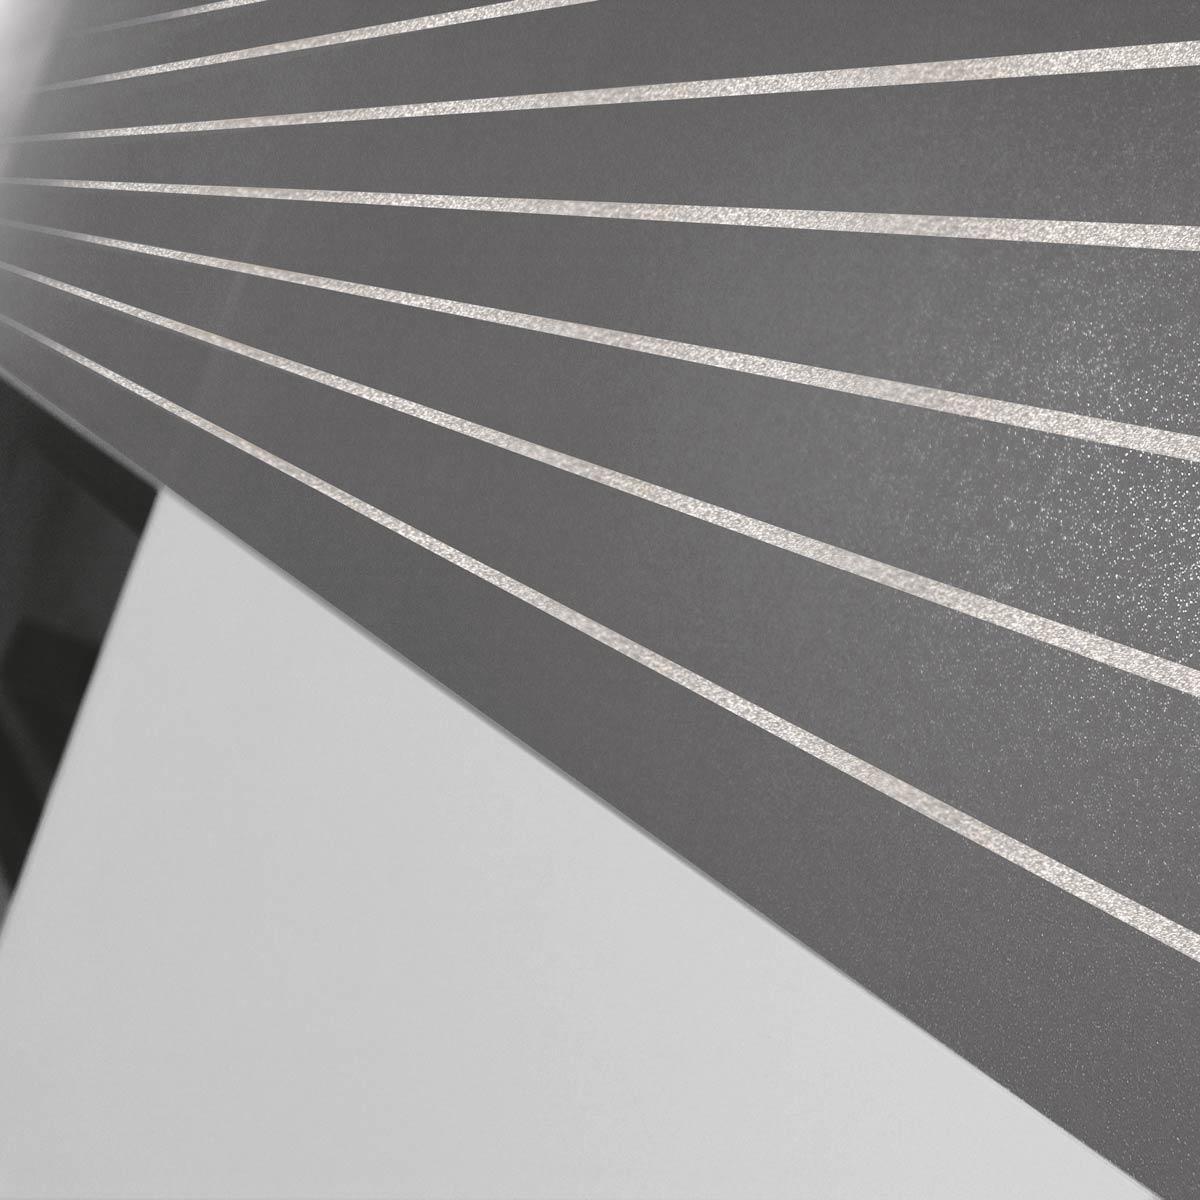 Profili per rivestimenti Listec LI 10 AGS Profilitec